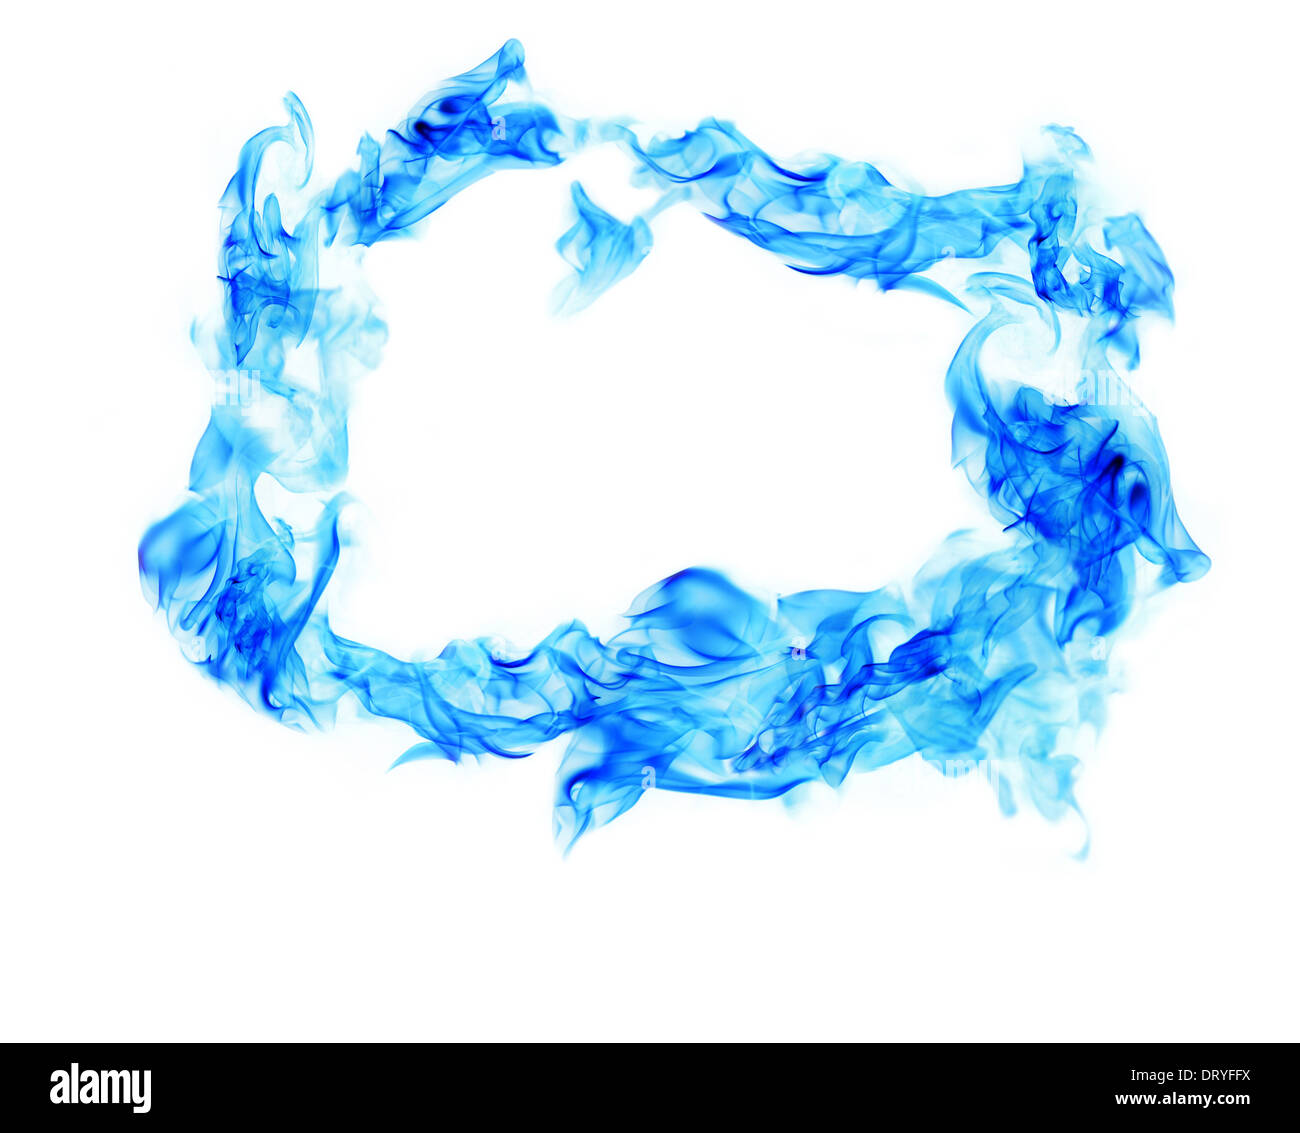 blue fire smoke frame on white background stock photo